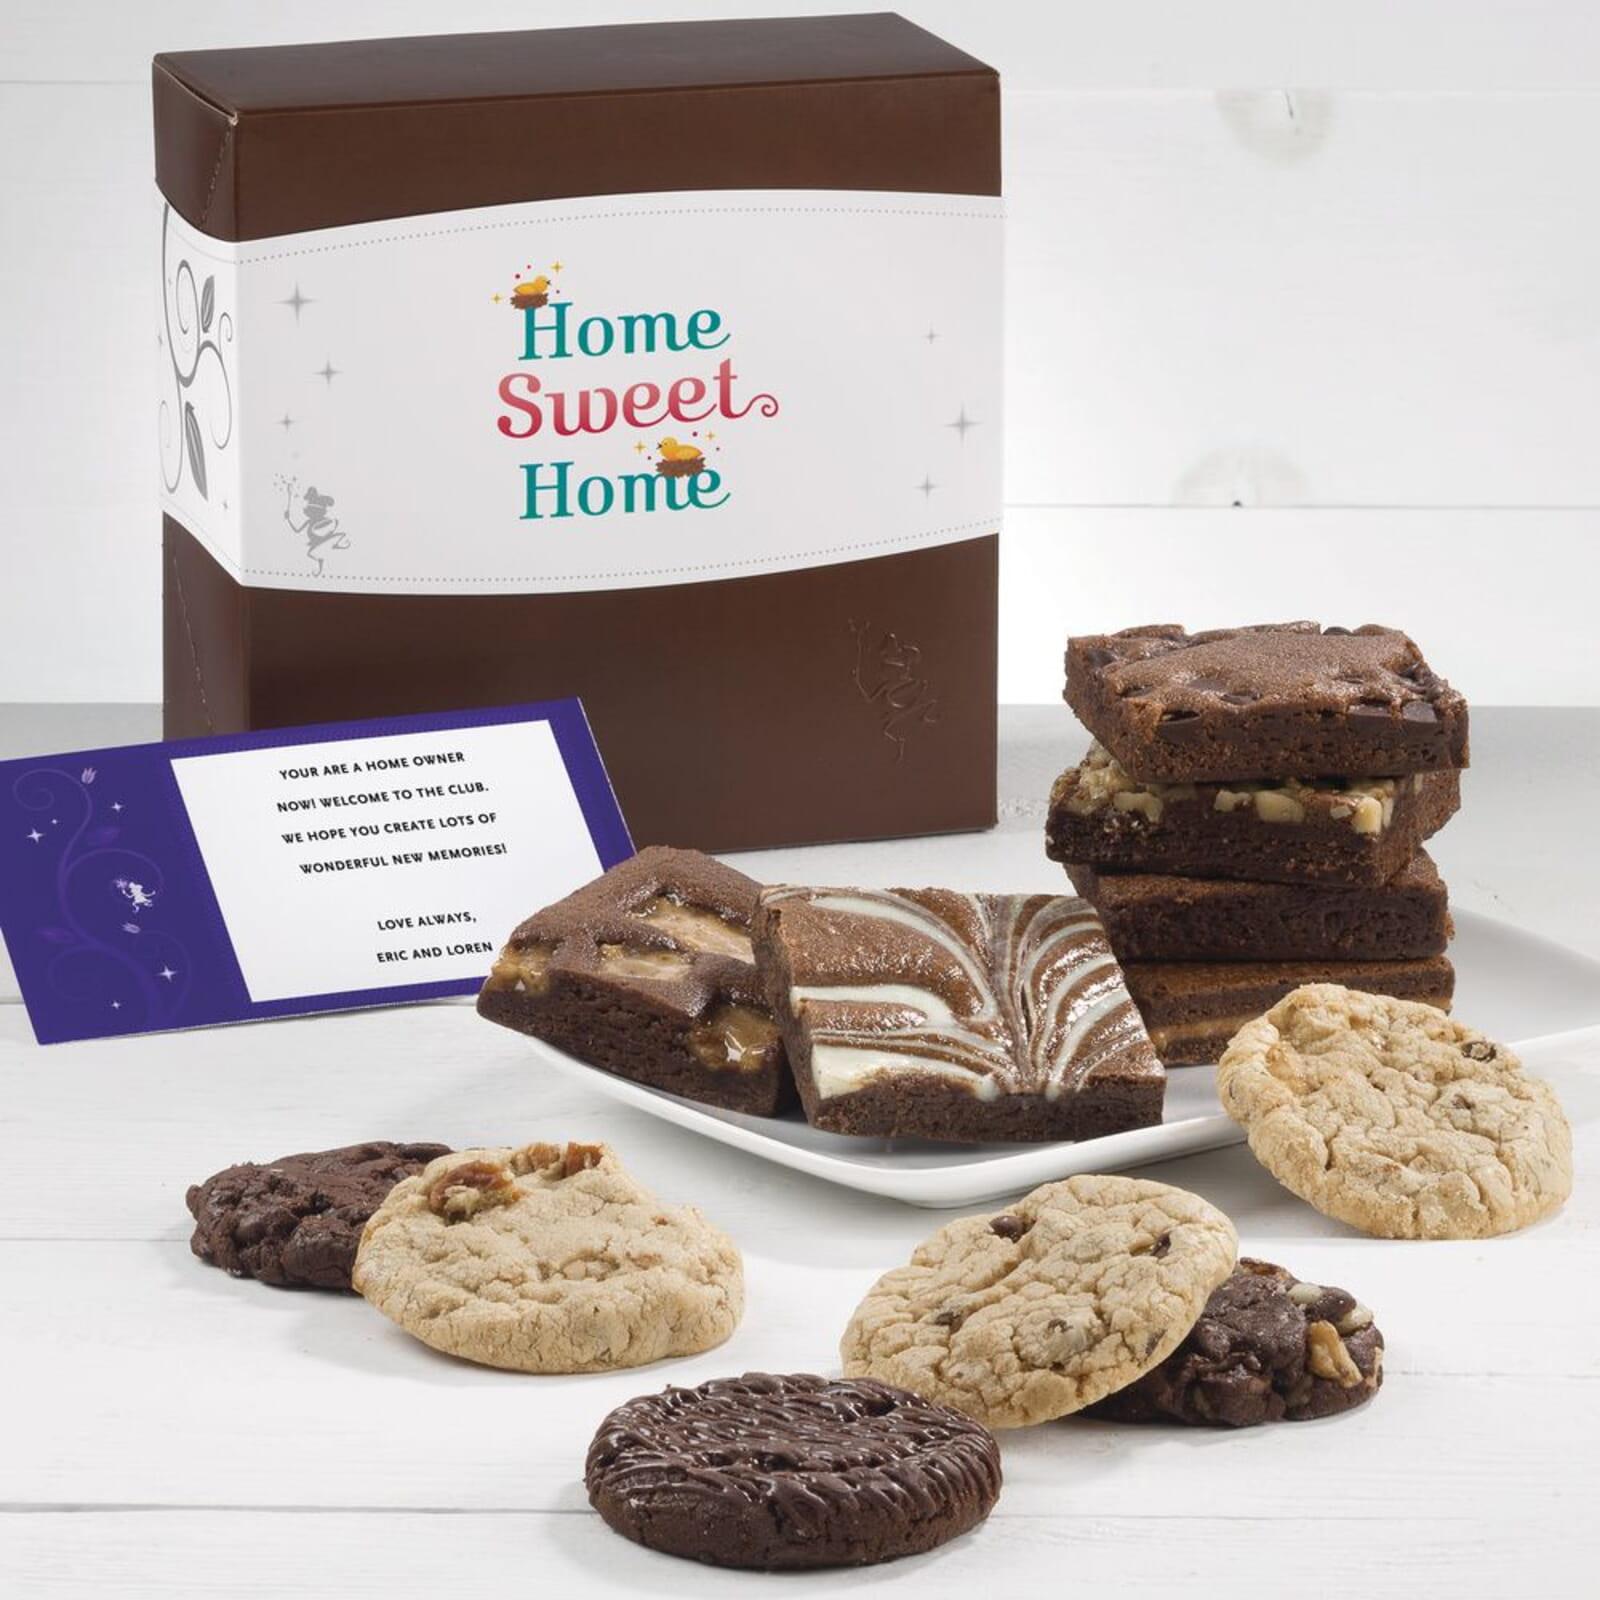 Home Sweet Home Cookie & Brownie Combo